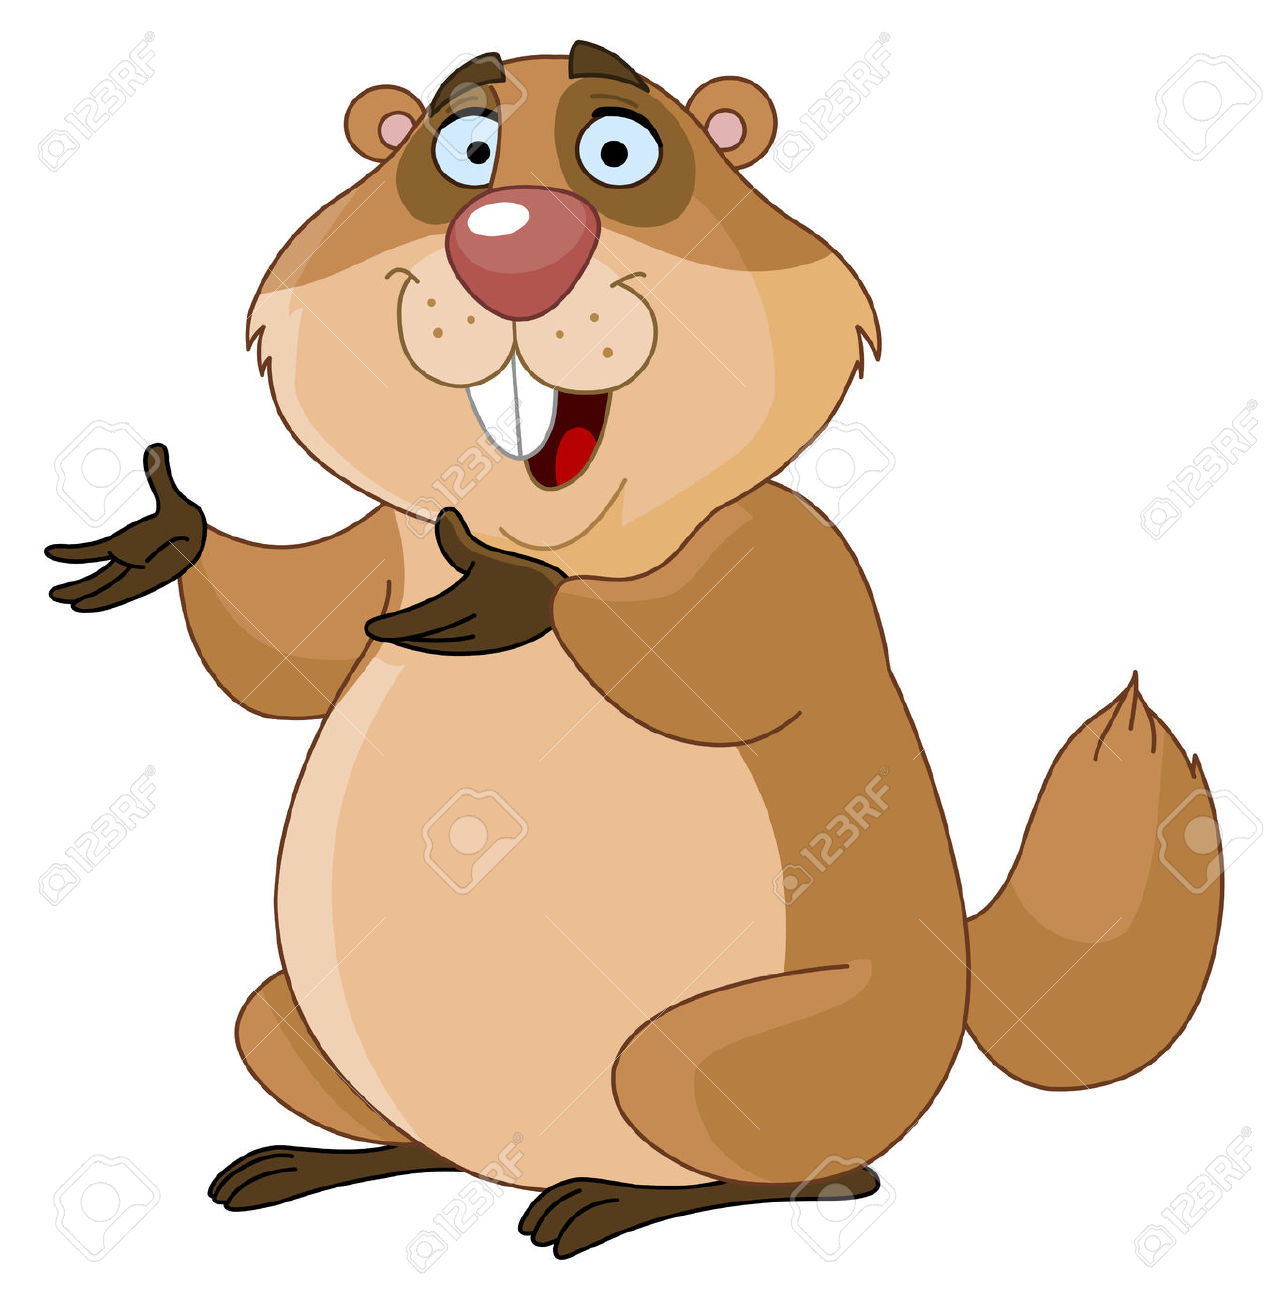 Free Groundhog Clipart. Groundhog Stock -Free Groundhog Clipart. Groundhog Stock Vector - .-6